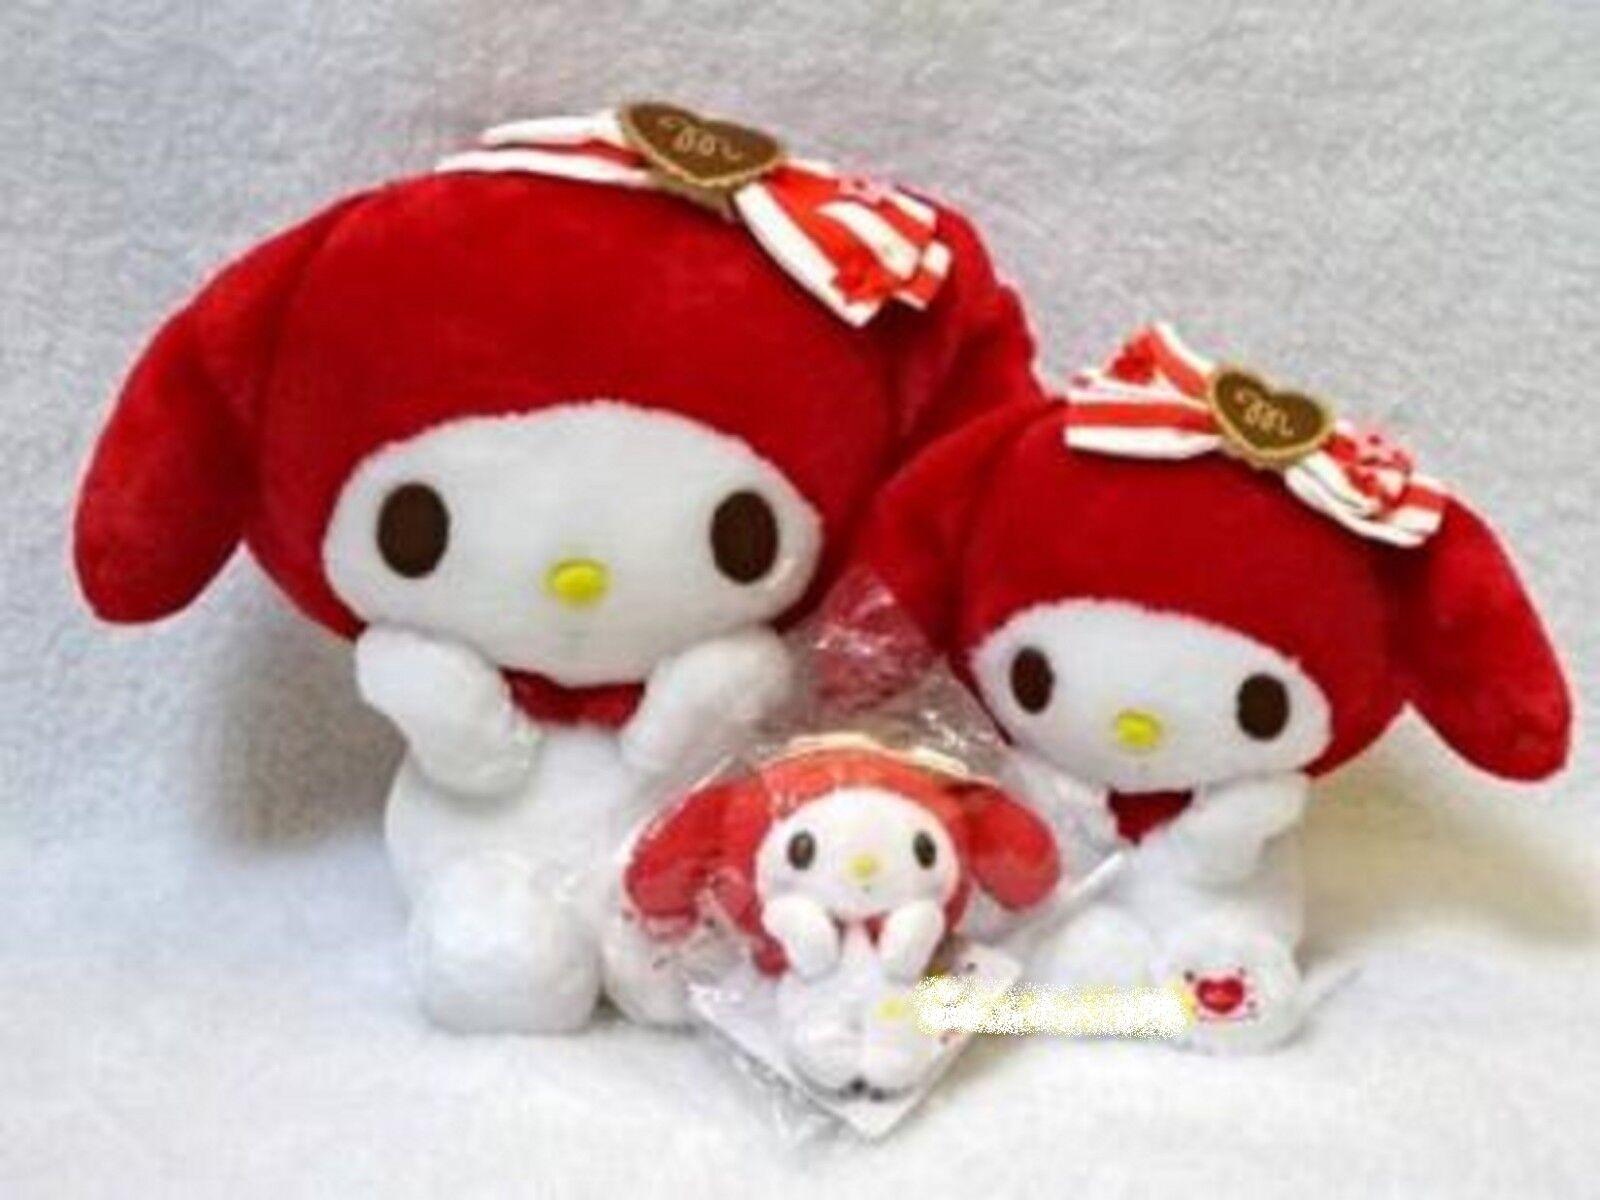 My melody Plush Doll Red 40th Anniversary Limited  2015 SANRIO Cute Mascot RARE